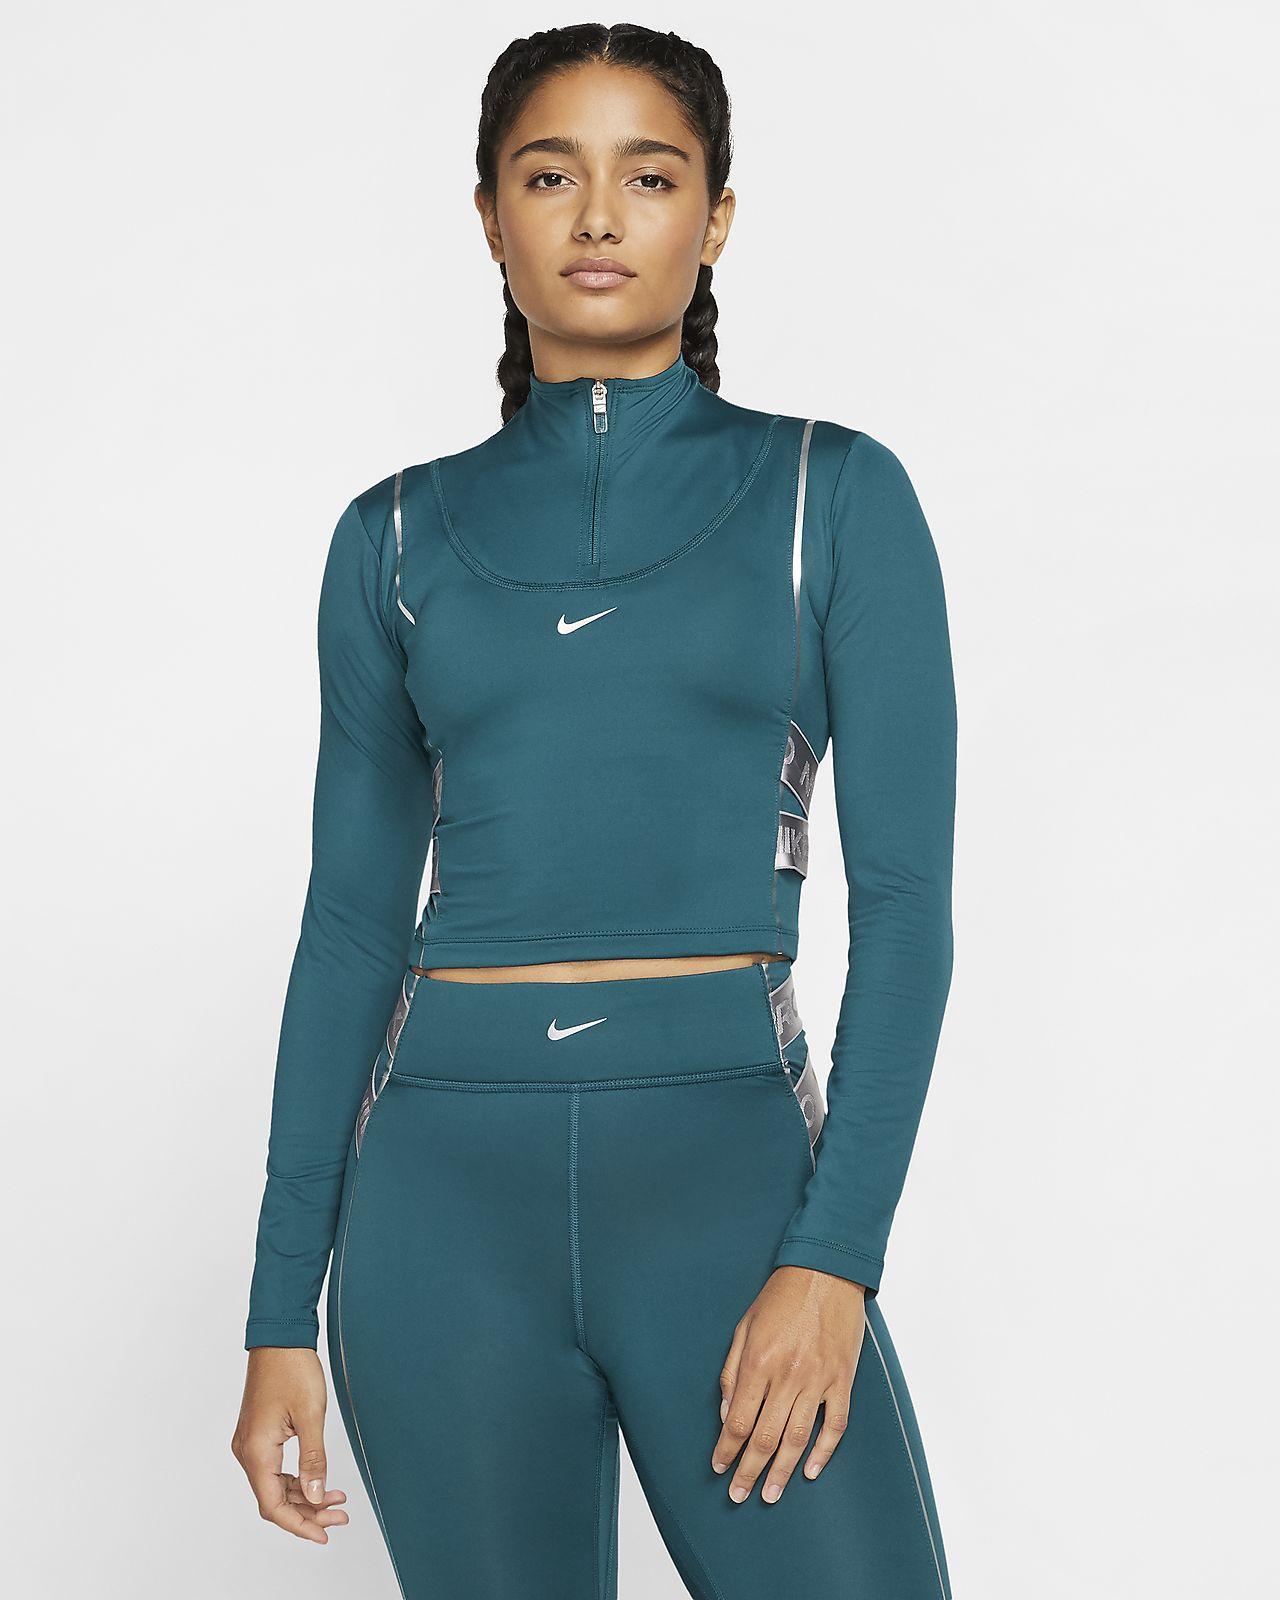 Nike Pro HyperWarm Women's 1/2-Zip Long-Sleeve Top